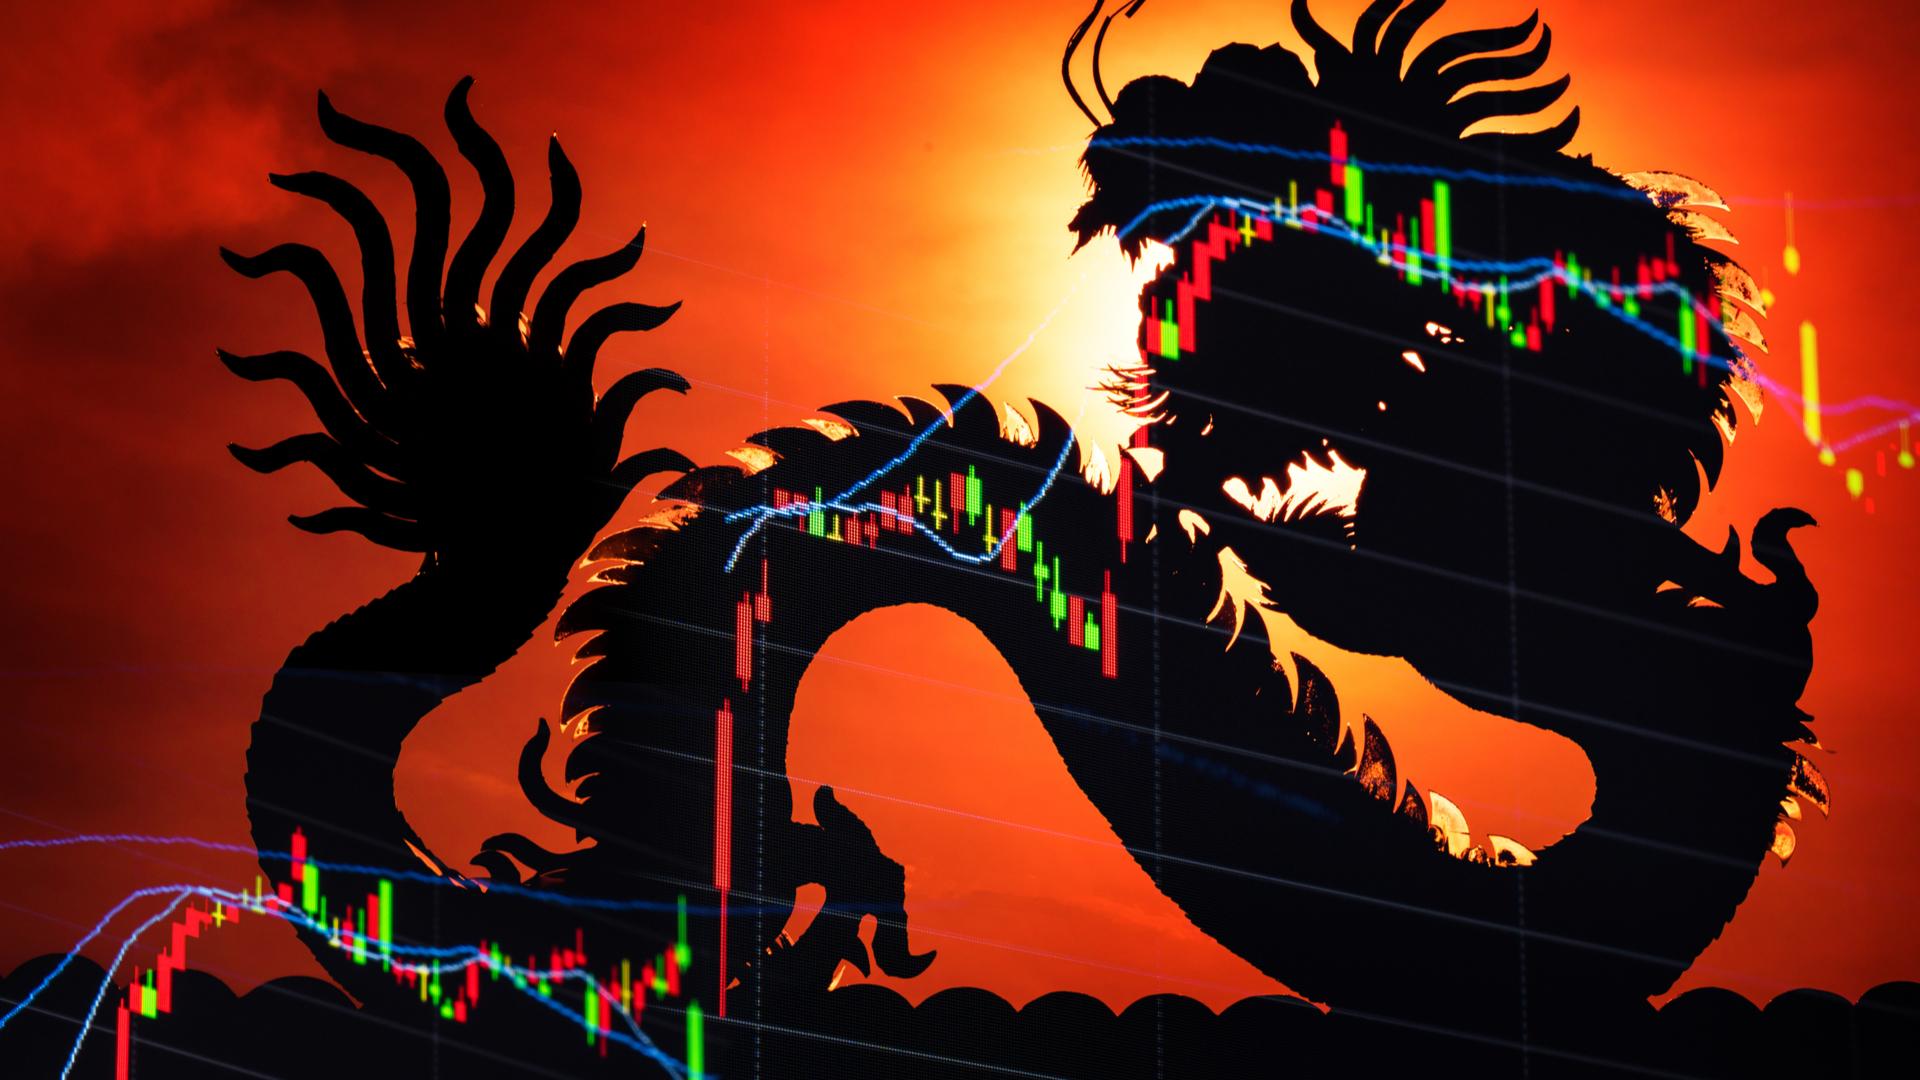 Kinas økonomi vokser under pandemien